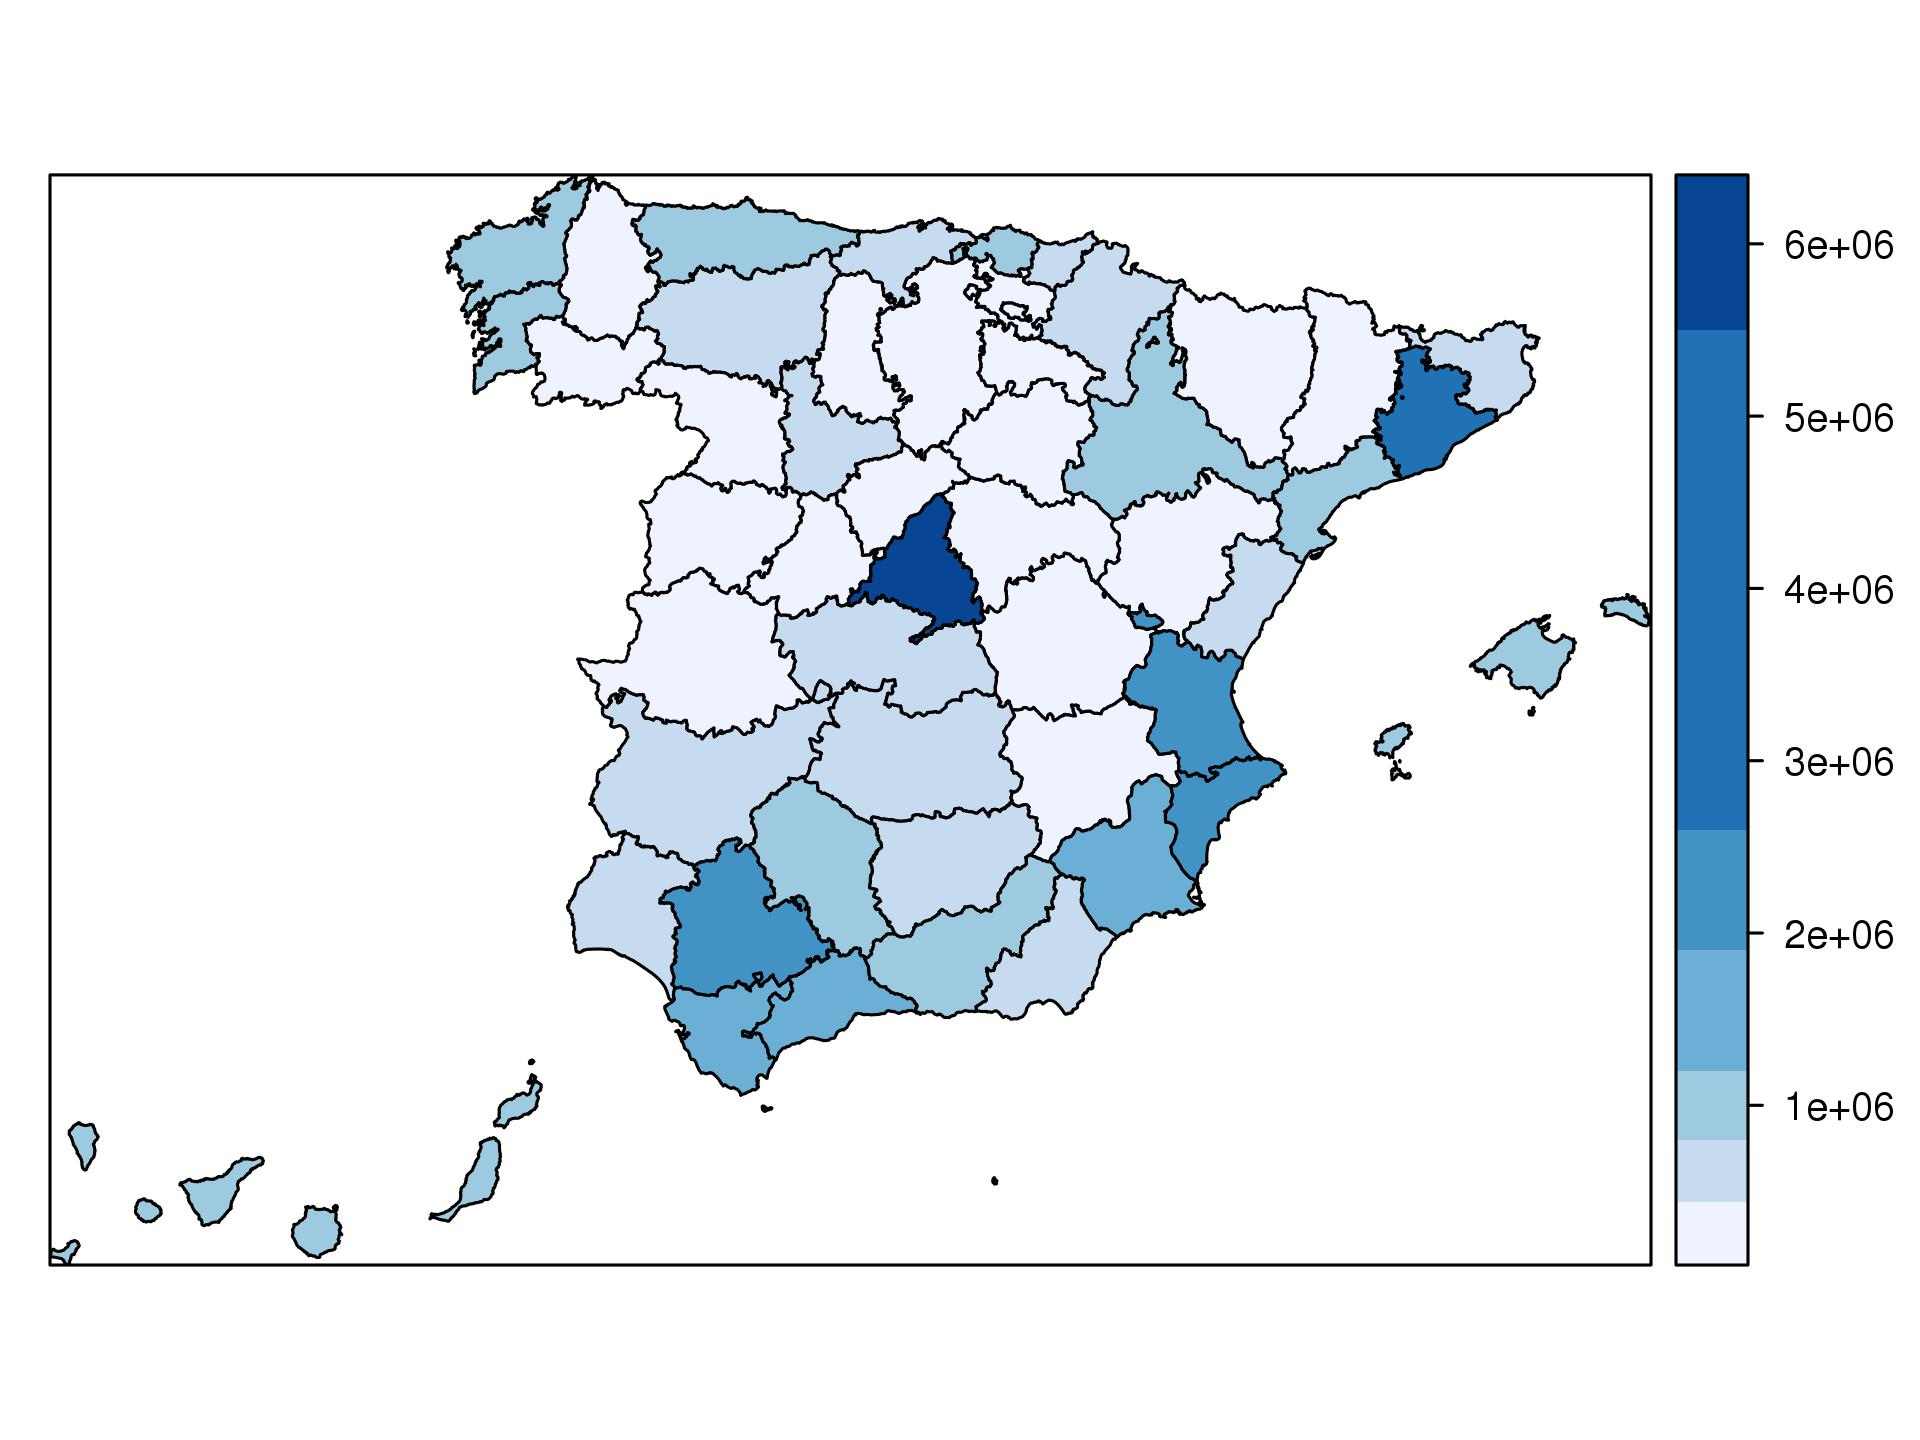 http://procomun.files.wordpress.com/2012/02/map.jpg